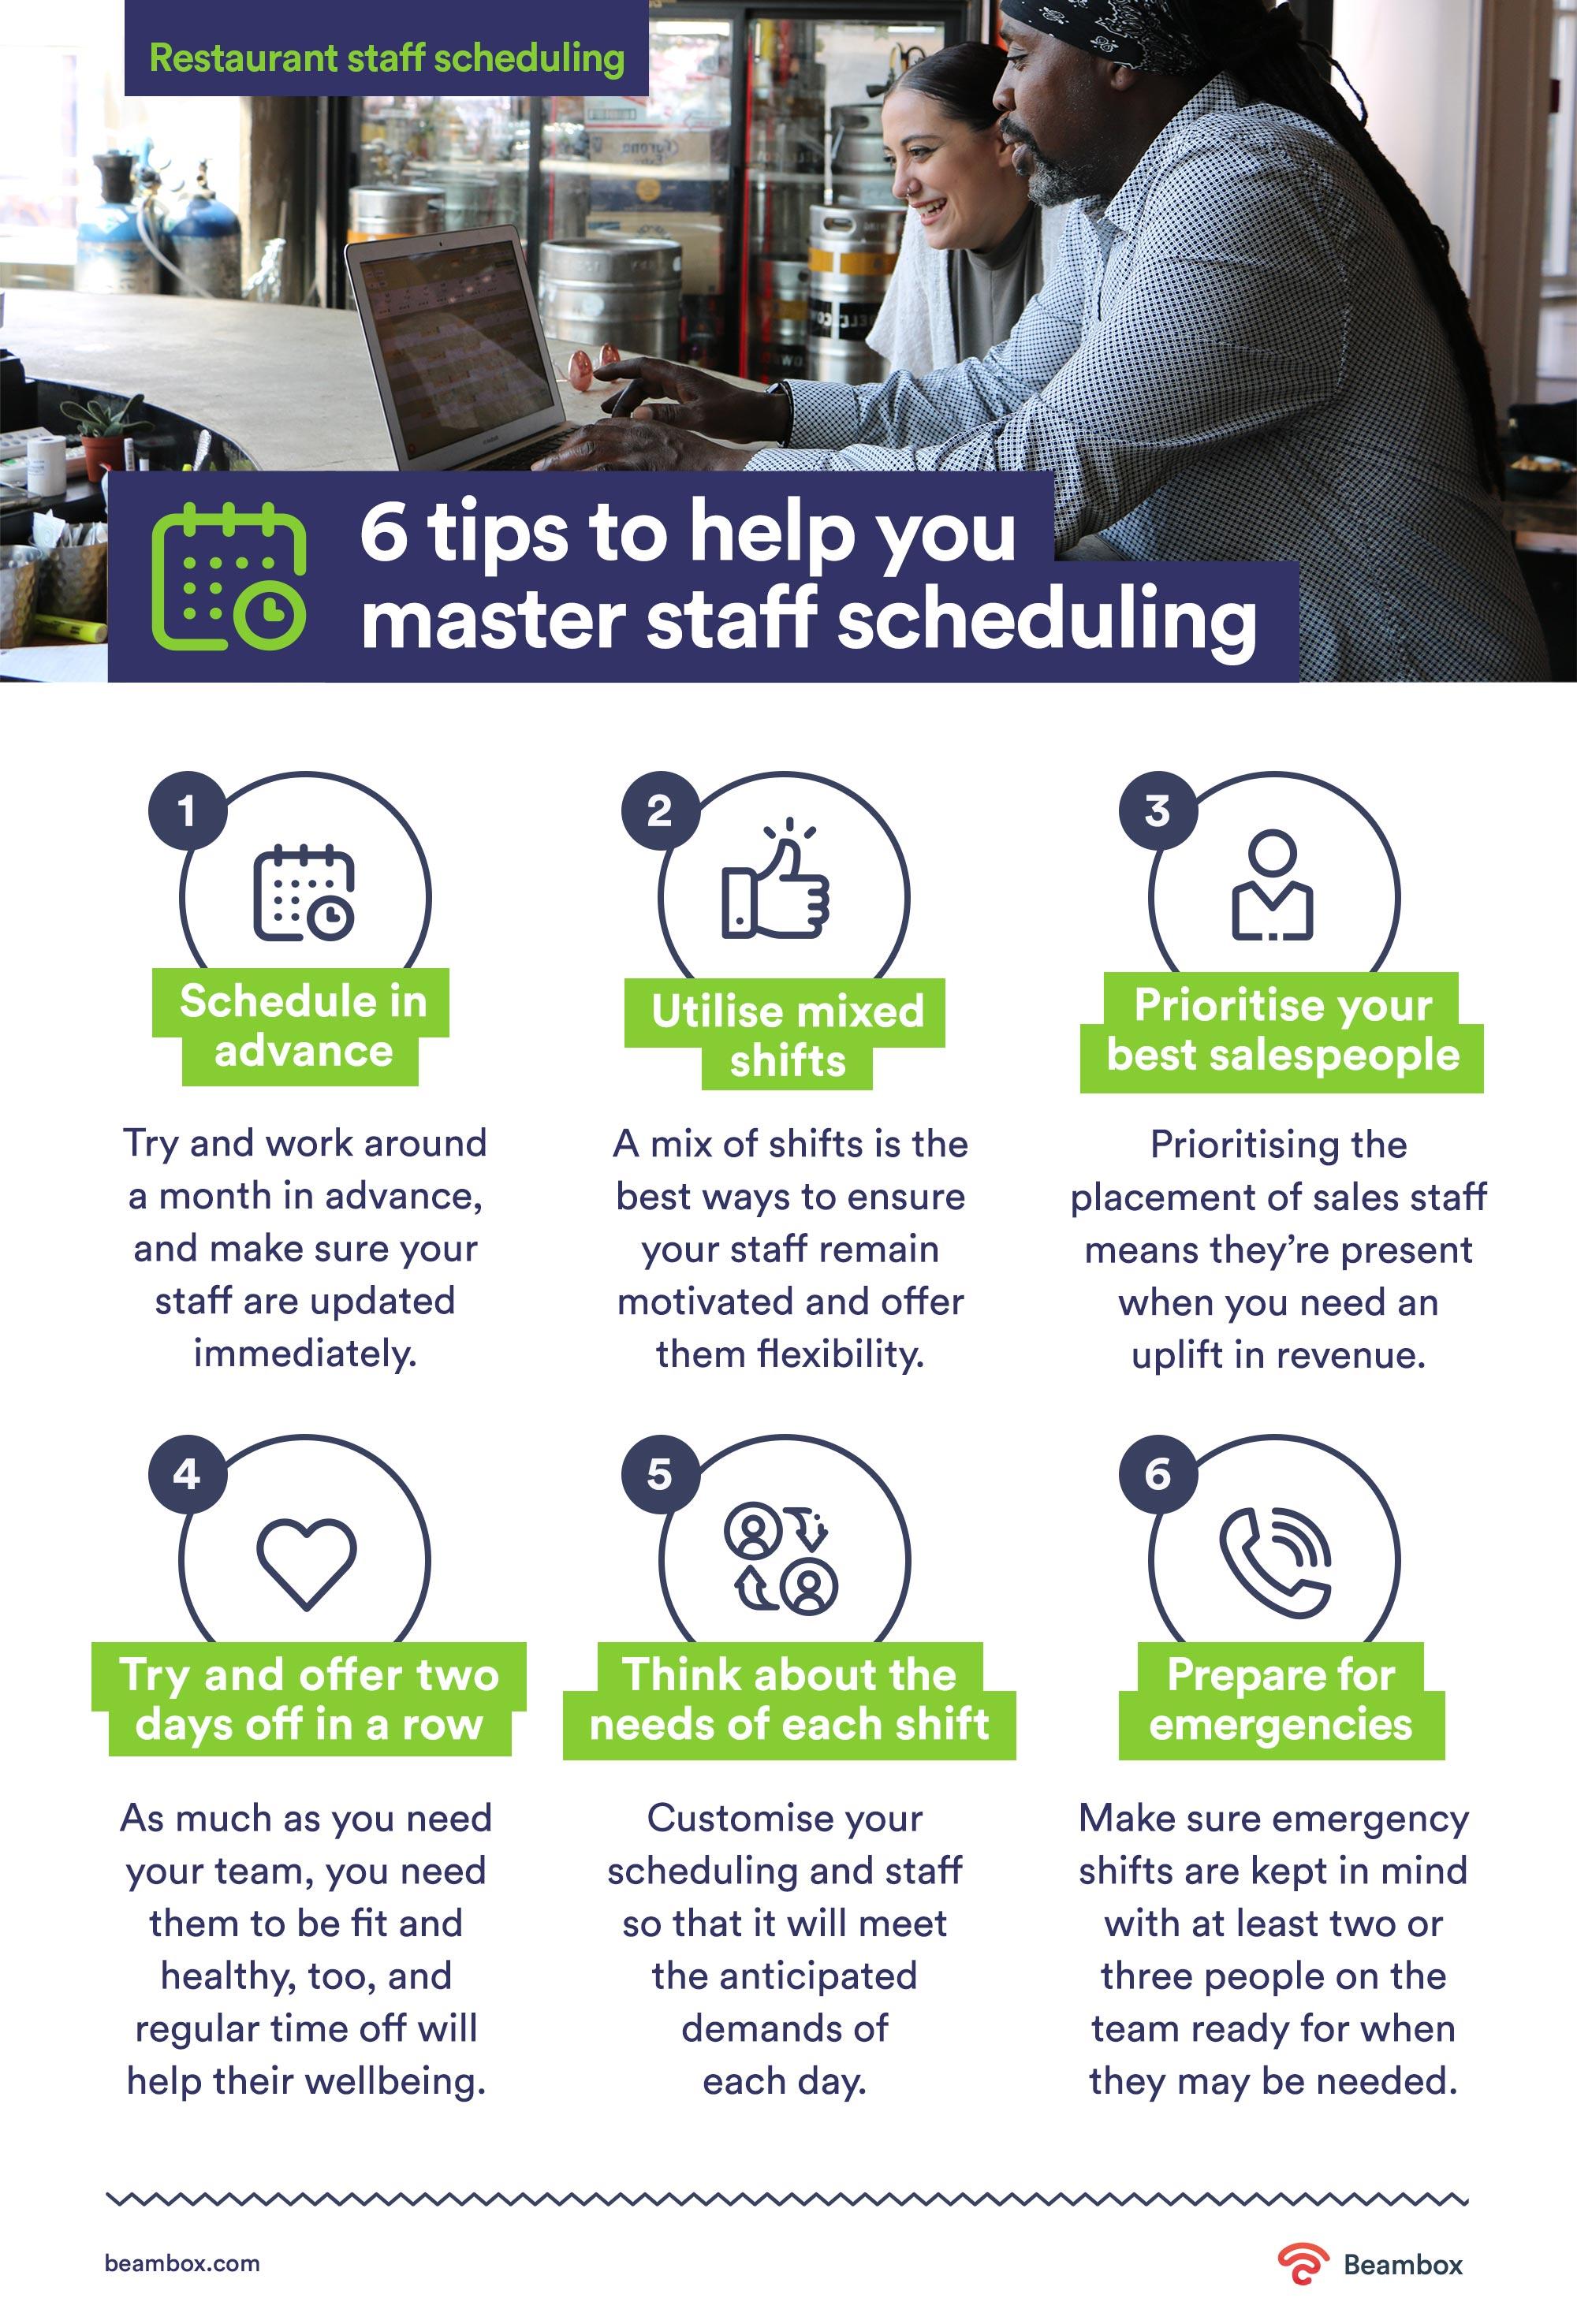 staff scheduling tips for restaurants